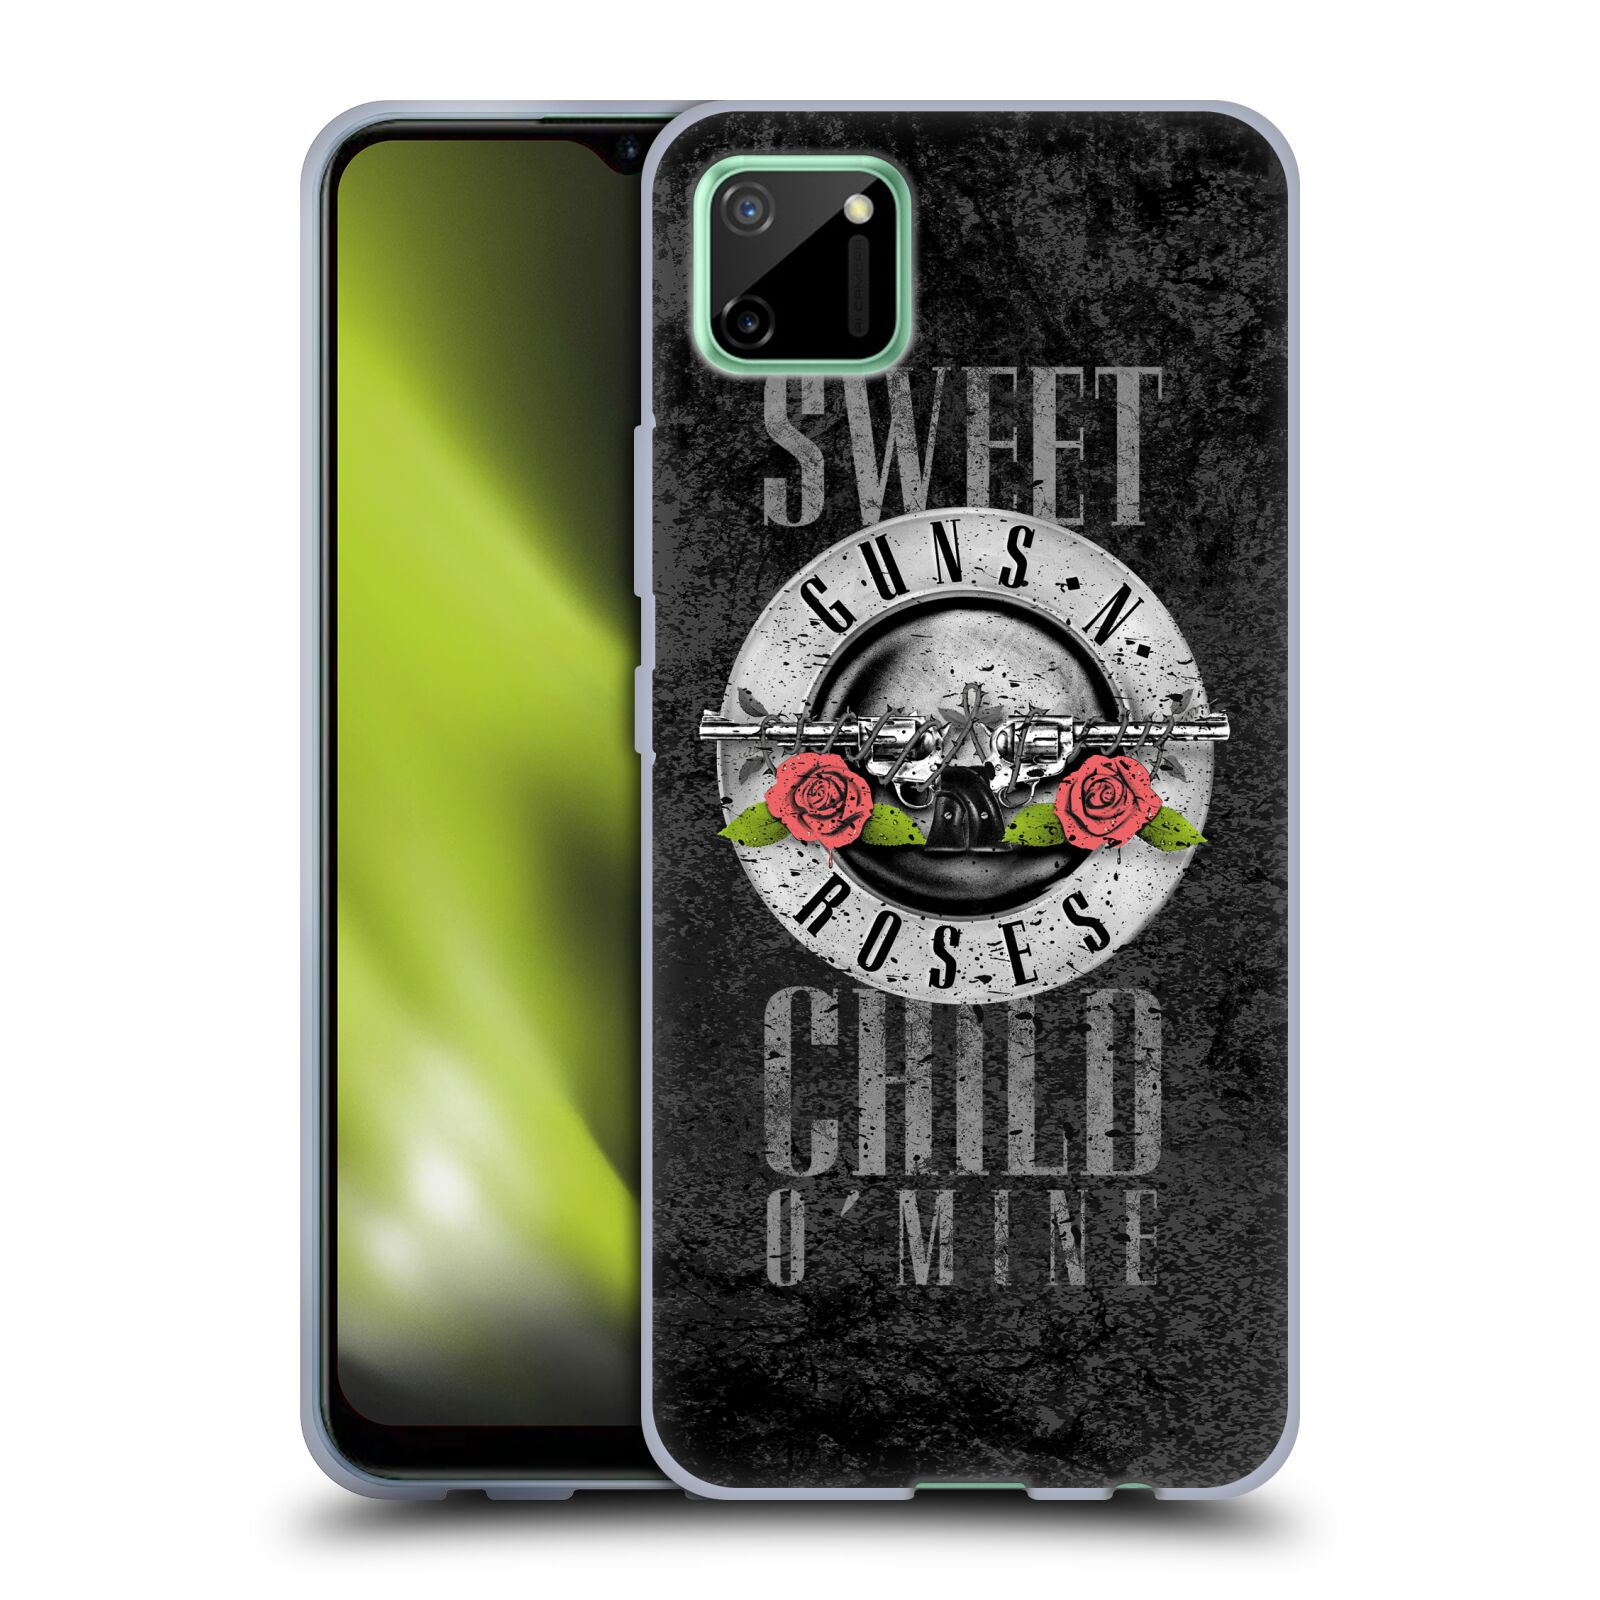 Silikonové pouzdro na mobil Realme C11 - Head Case - Guns N' Roses - Sweet Child